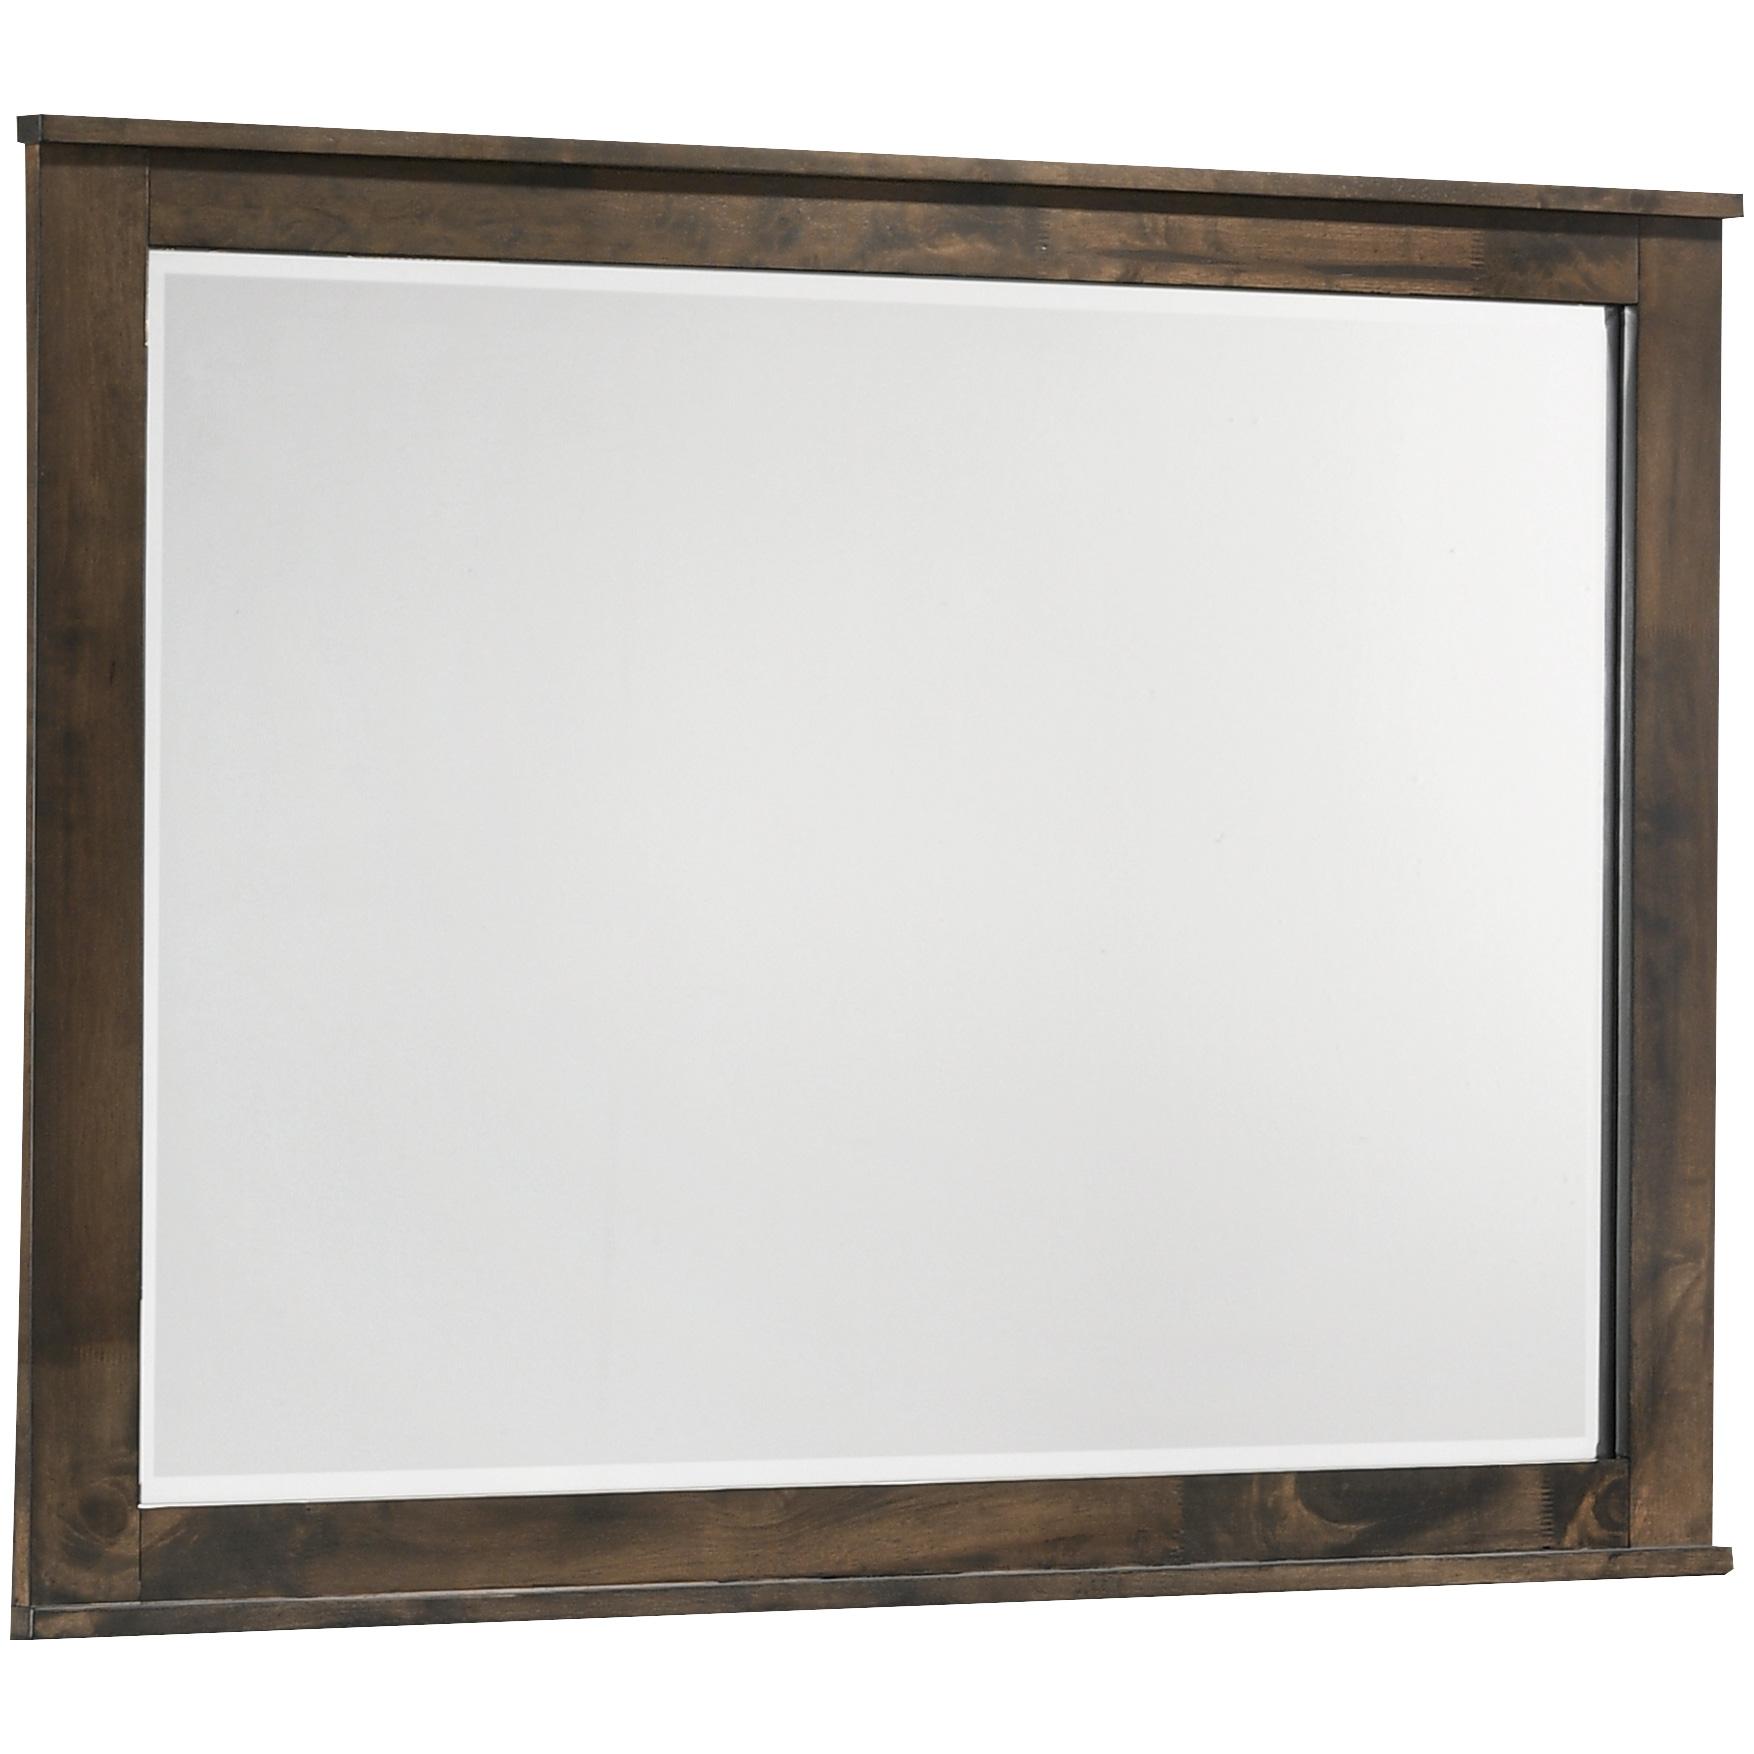 New Classic | Blue Ridge Rustic Gray Mirror